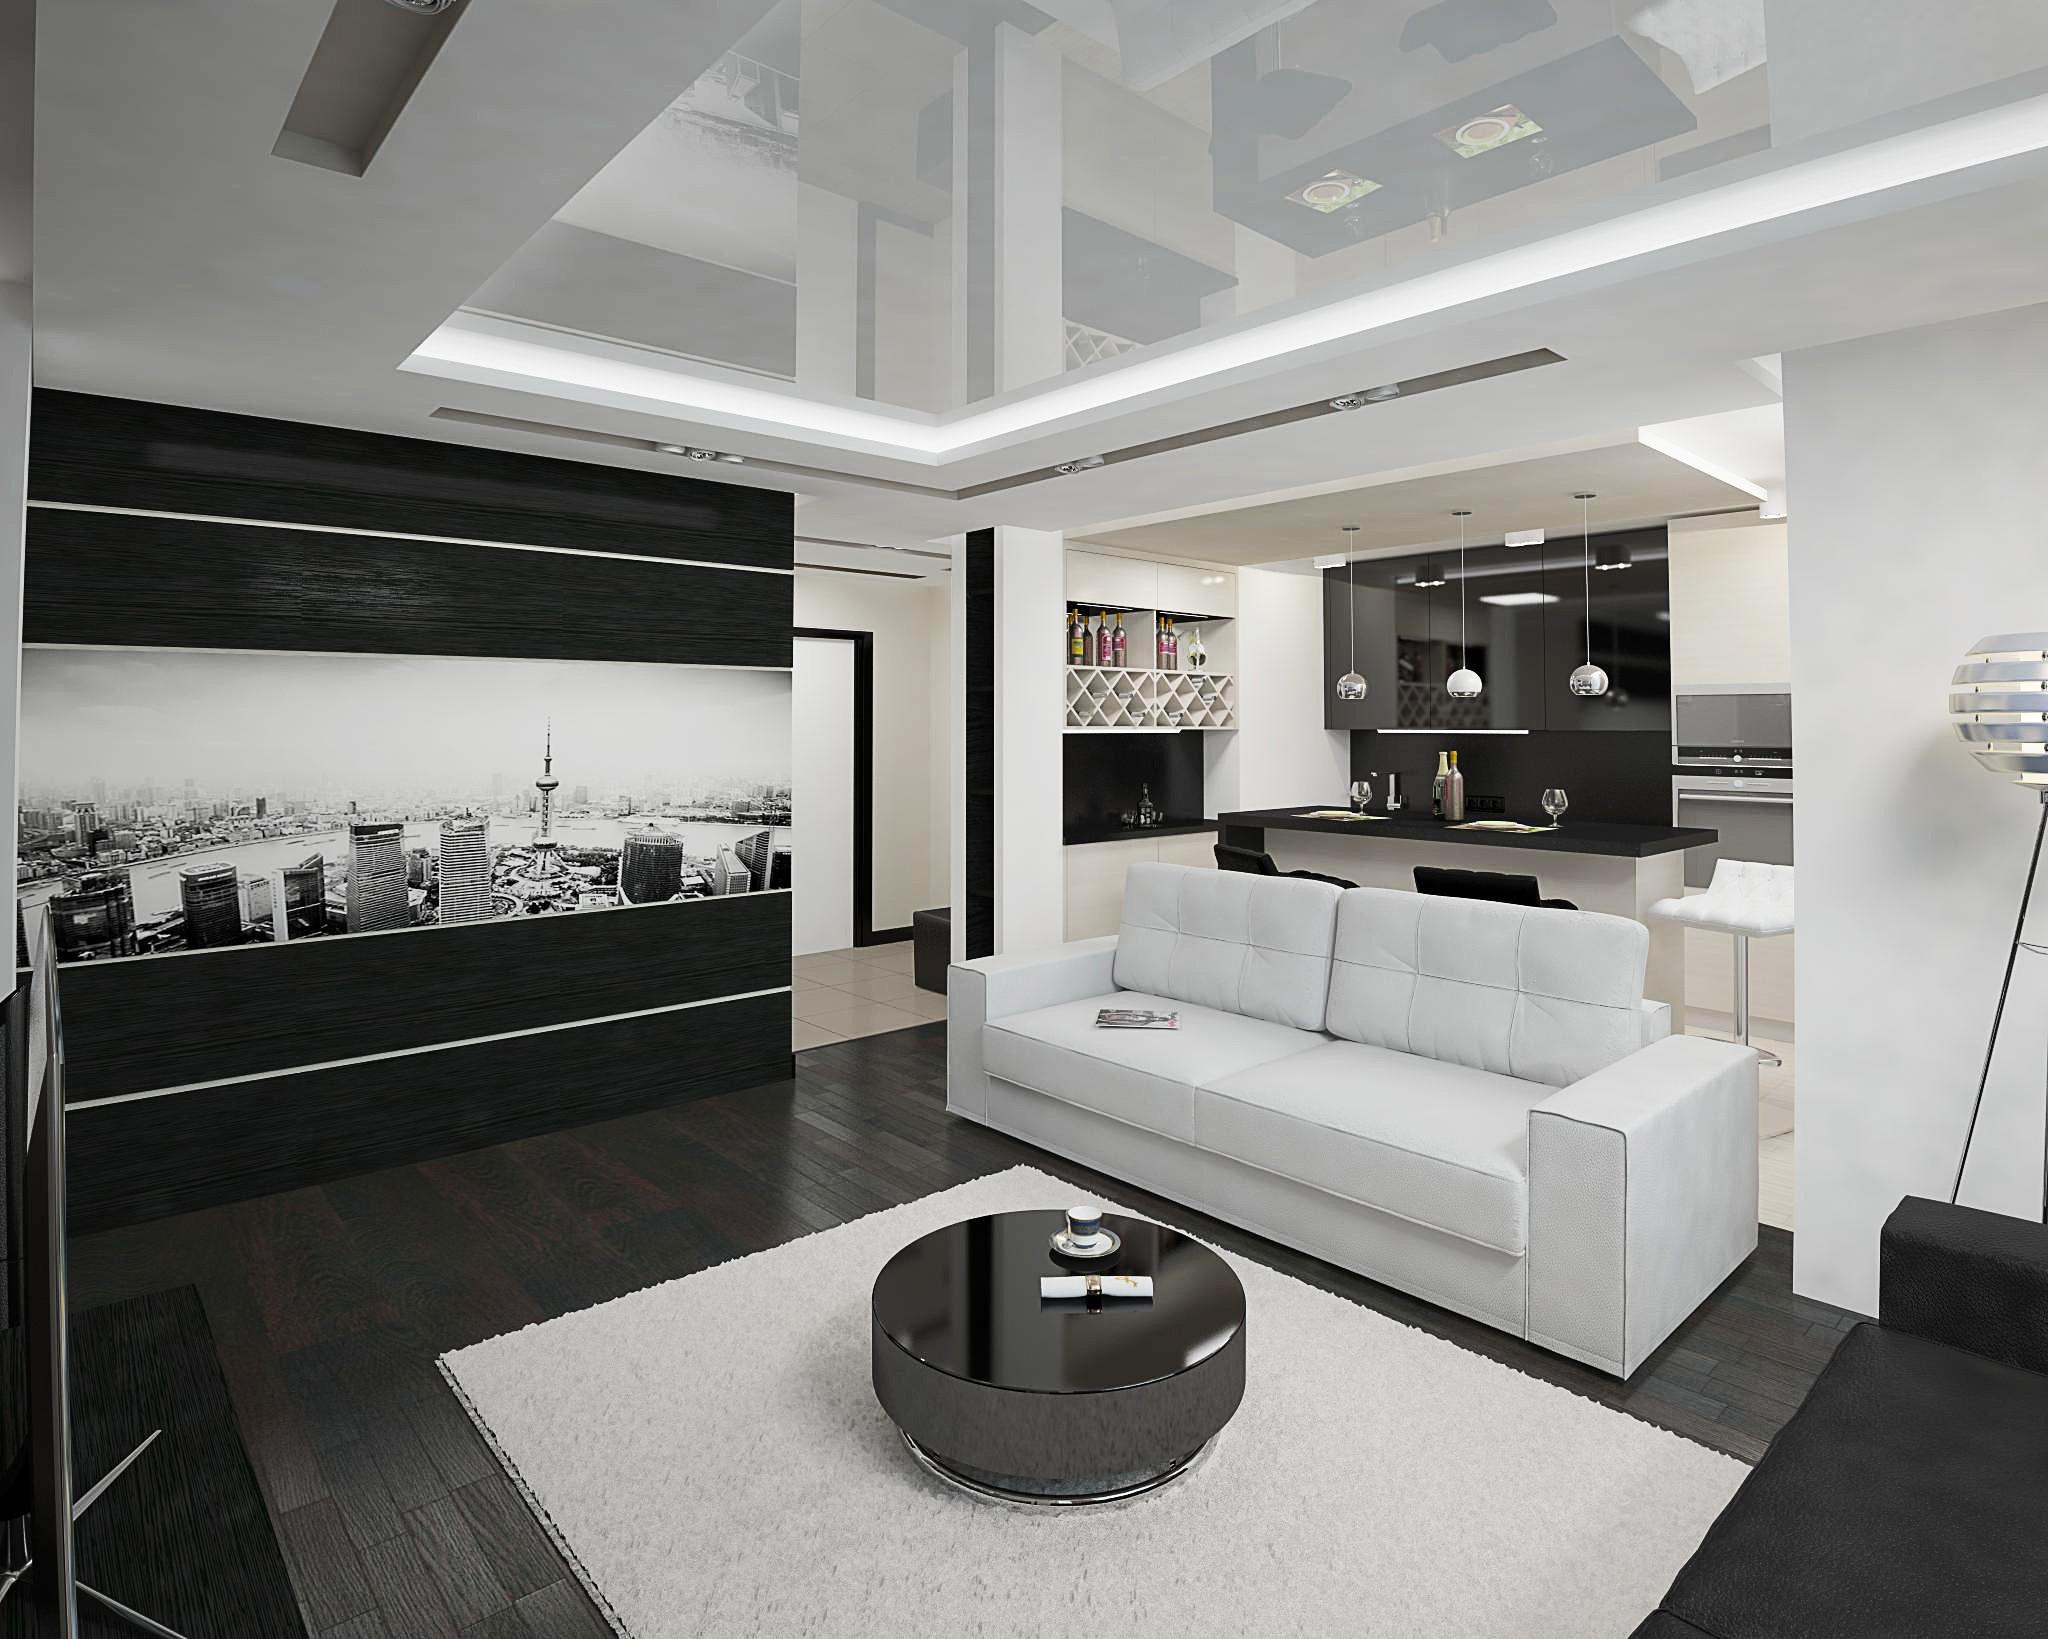 кухня гостиная 22 квадратных метра дизайн